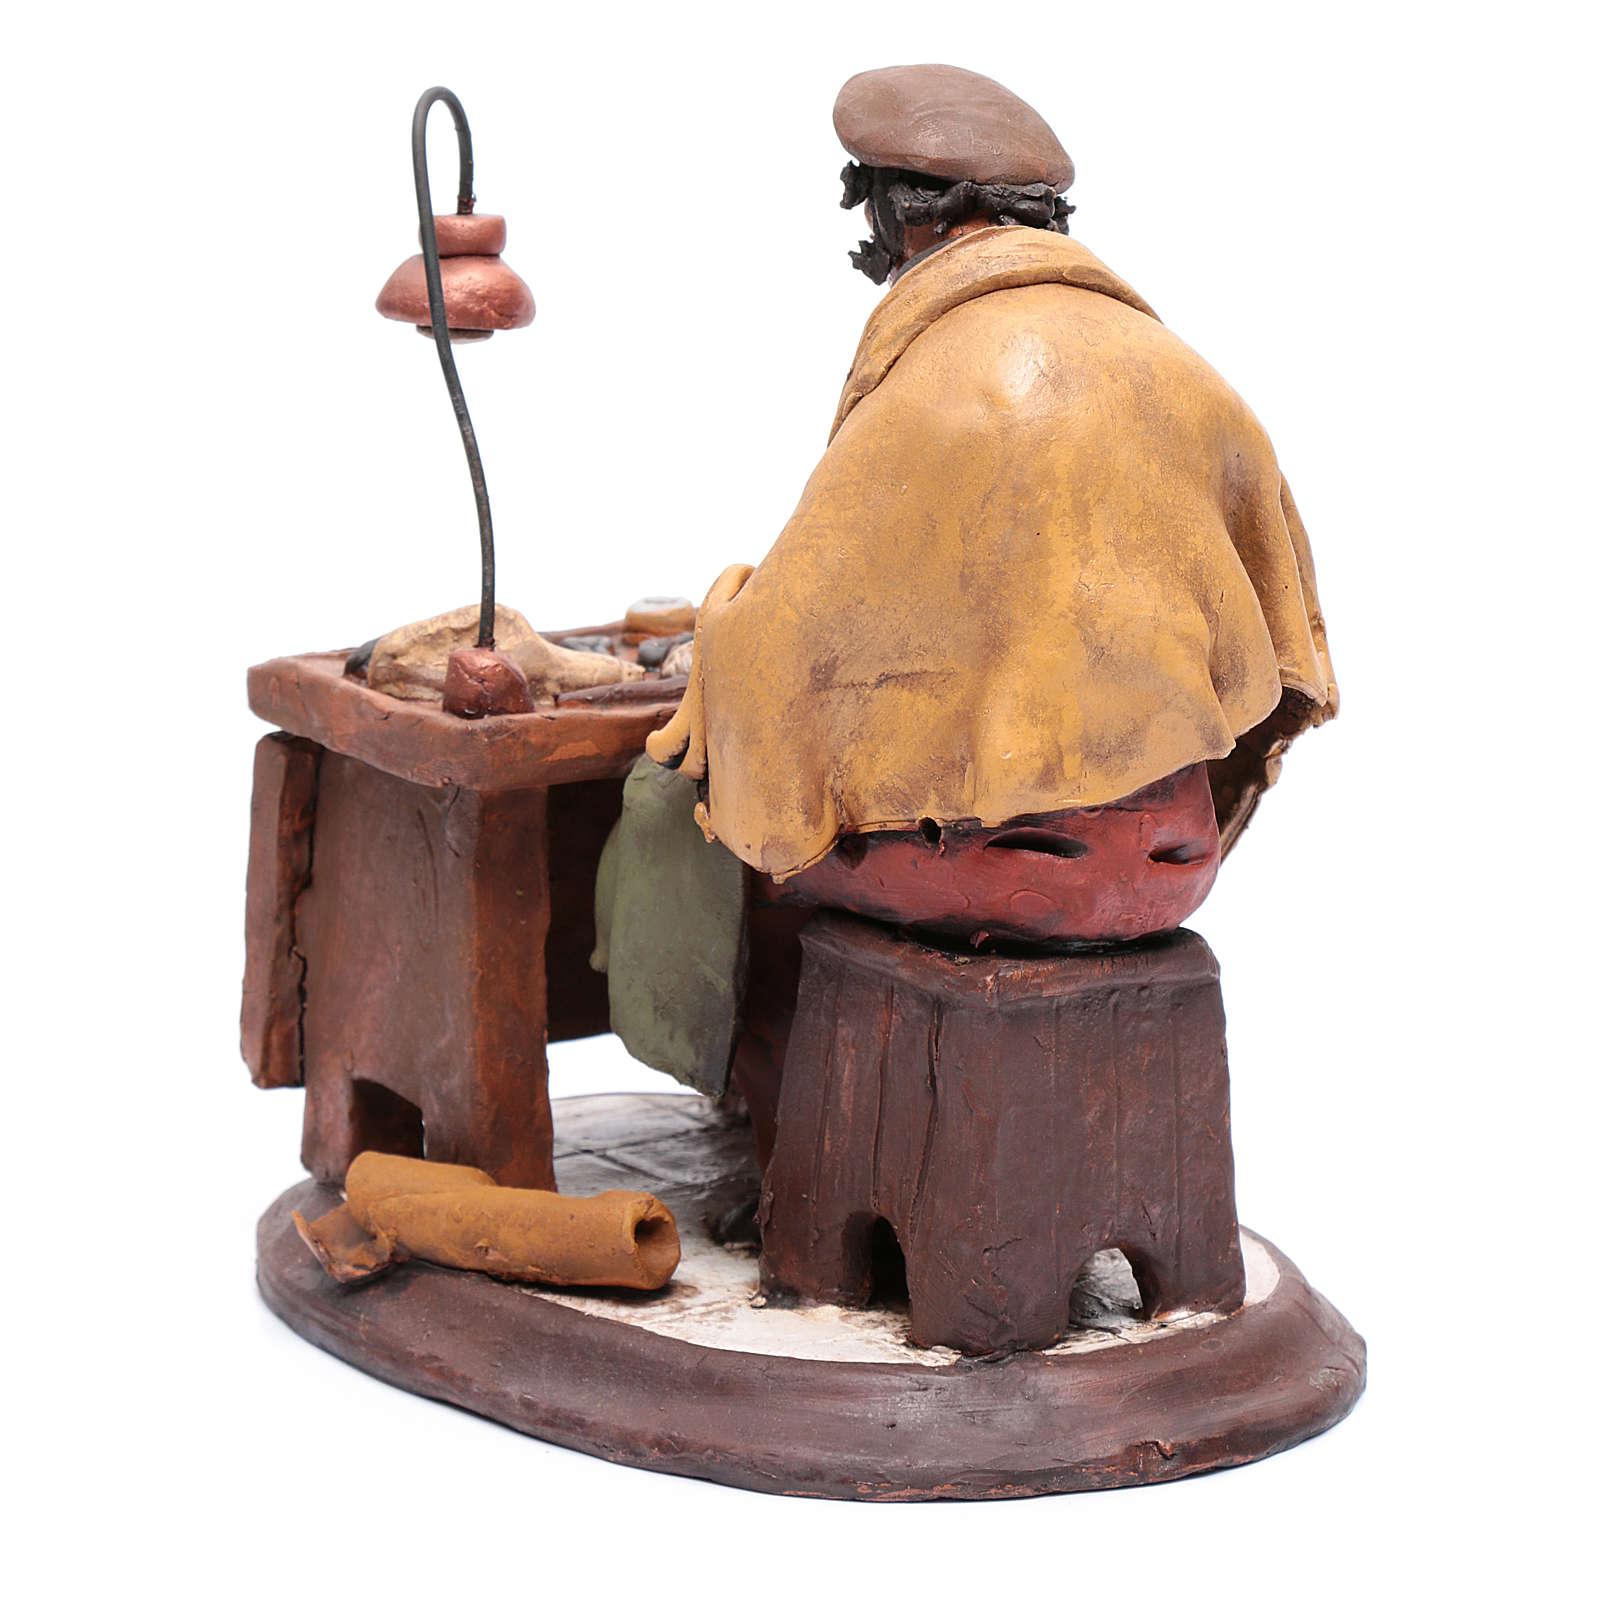 Calzolaio presepe Deruta 30 cm in terracotta 4